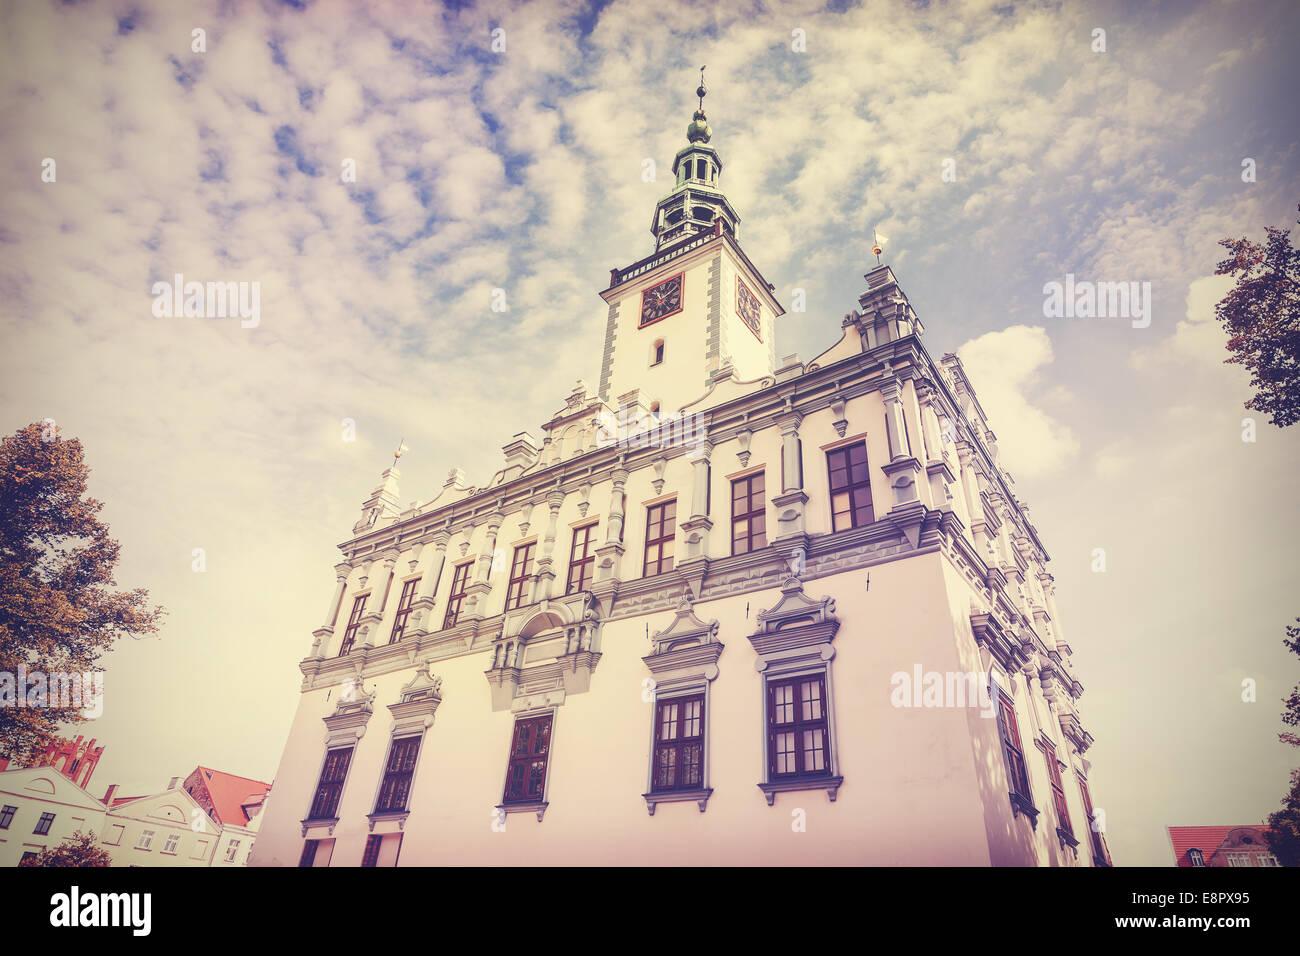 Vintage retro filtered photo of town hall in Chelmno, Poland. - Stock Image